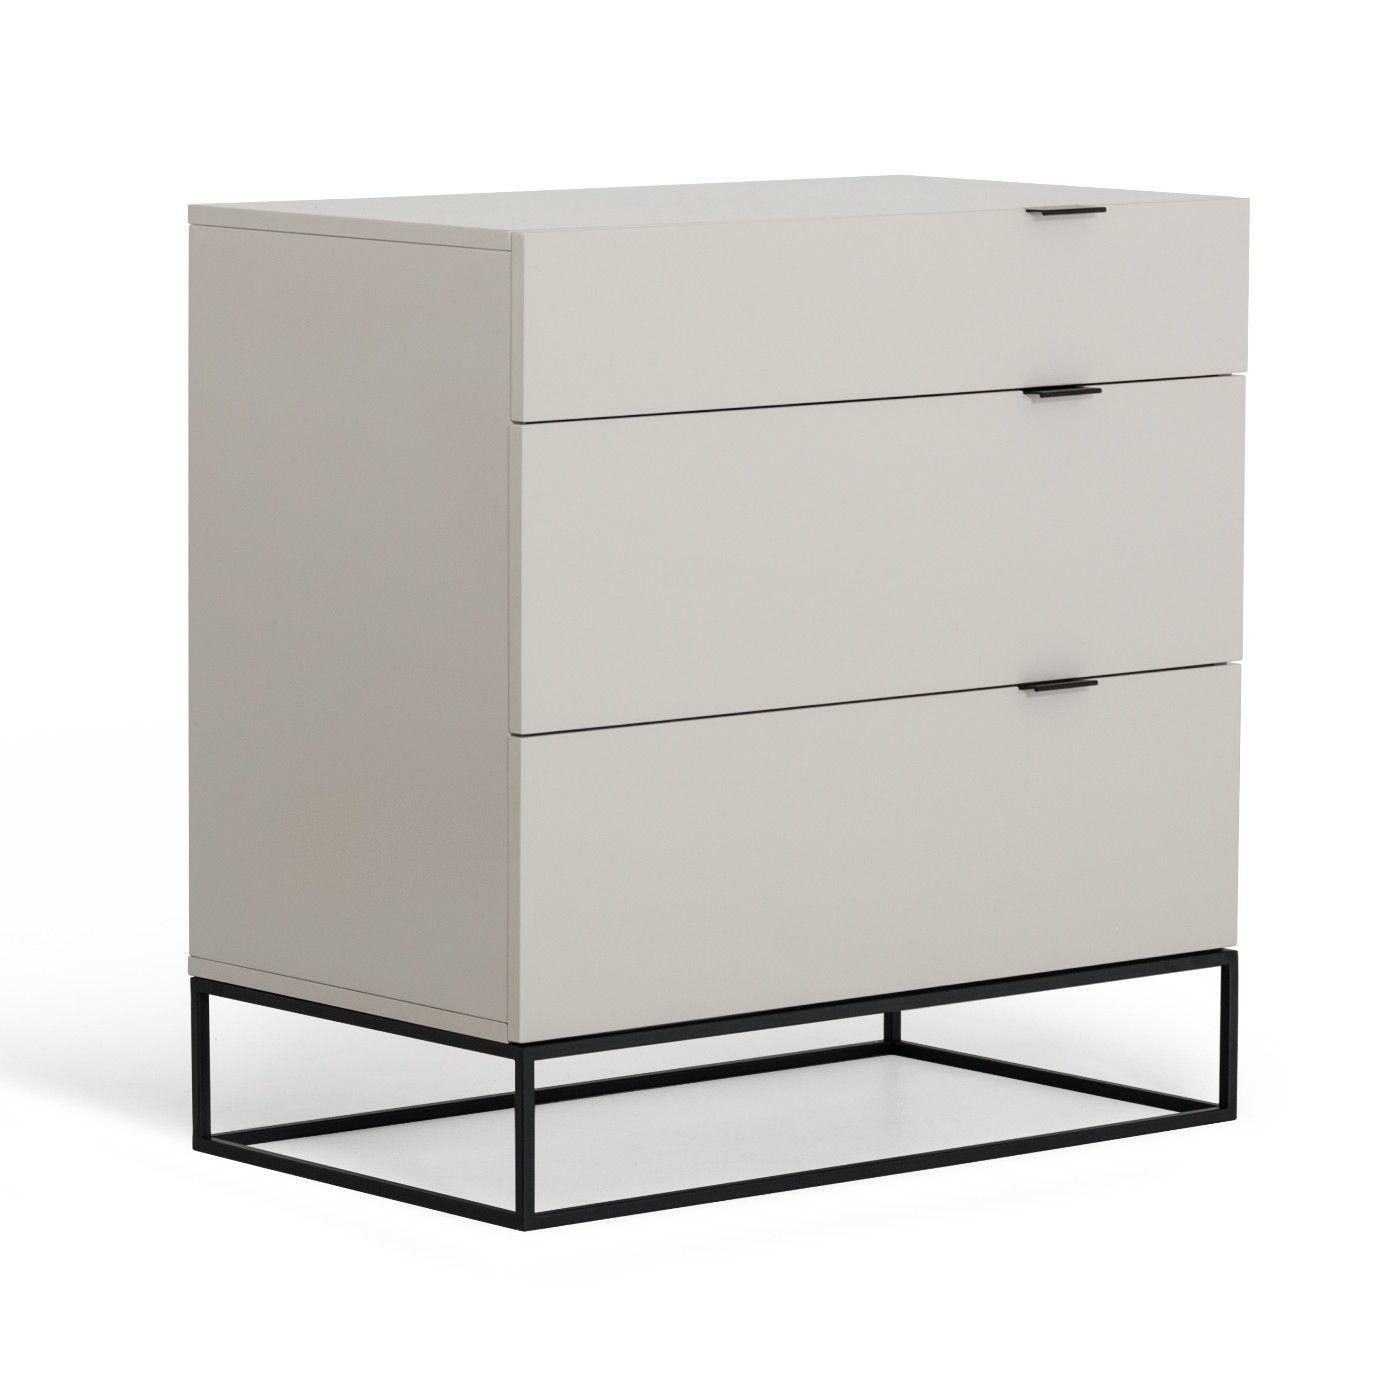 Patterson 3 Drawer Dresser Grey Dresser Modern Dresser Dresser As Nightstand [ 1397 x 1397 Pixel ]